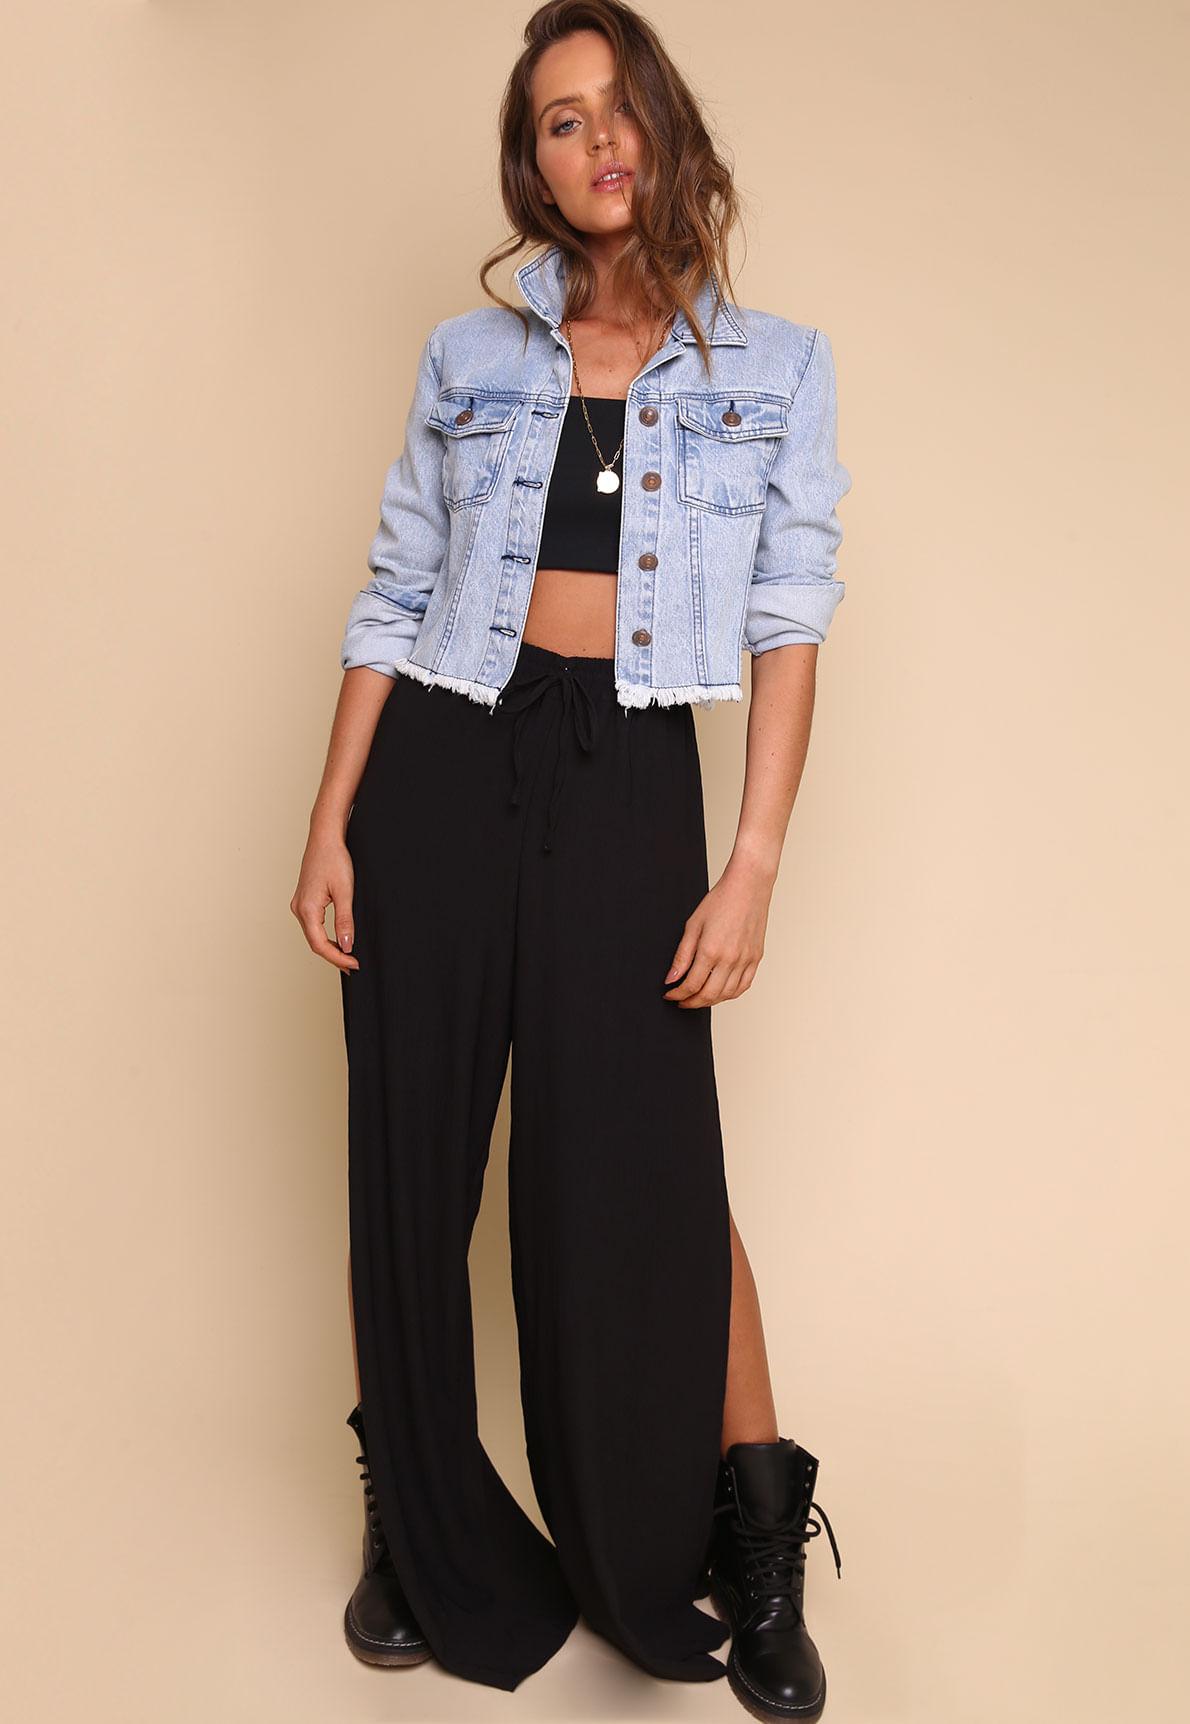 24080-jaqueta-jeans-cropped-florence-mundo-lolita-06